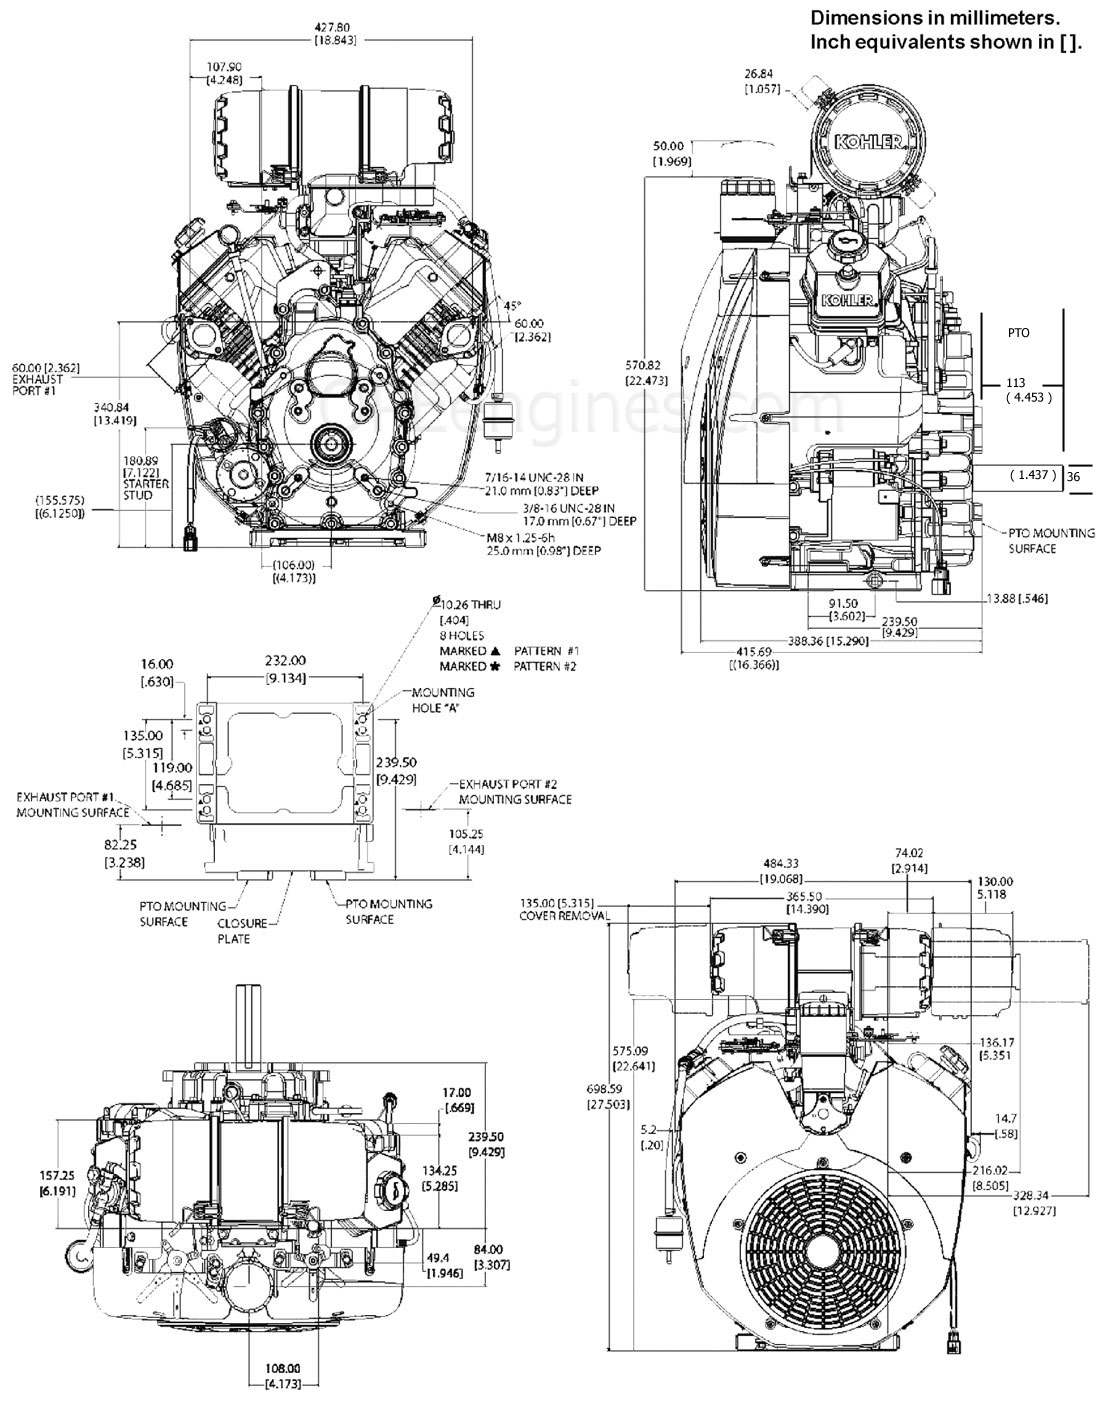 CH980_drawings?resize=680%2C878&ssl=1 25 hp kohler wiring diagram kohler command 25 hp diagram, kohler kohler motor wiring diagram at pacquiaovsvargaslive.co